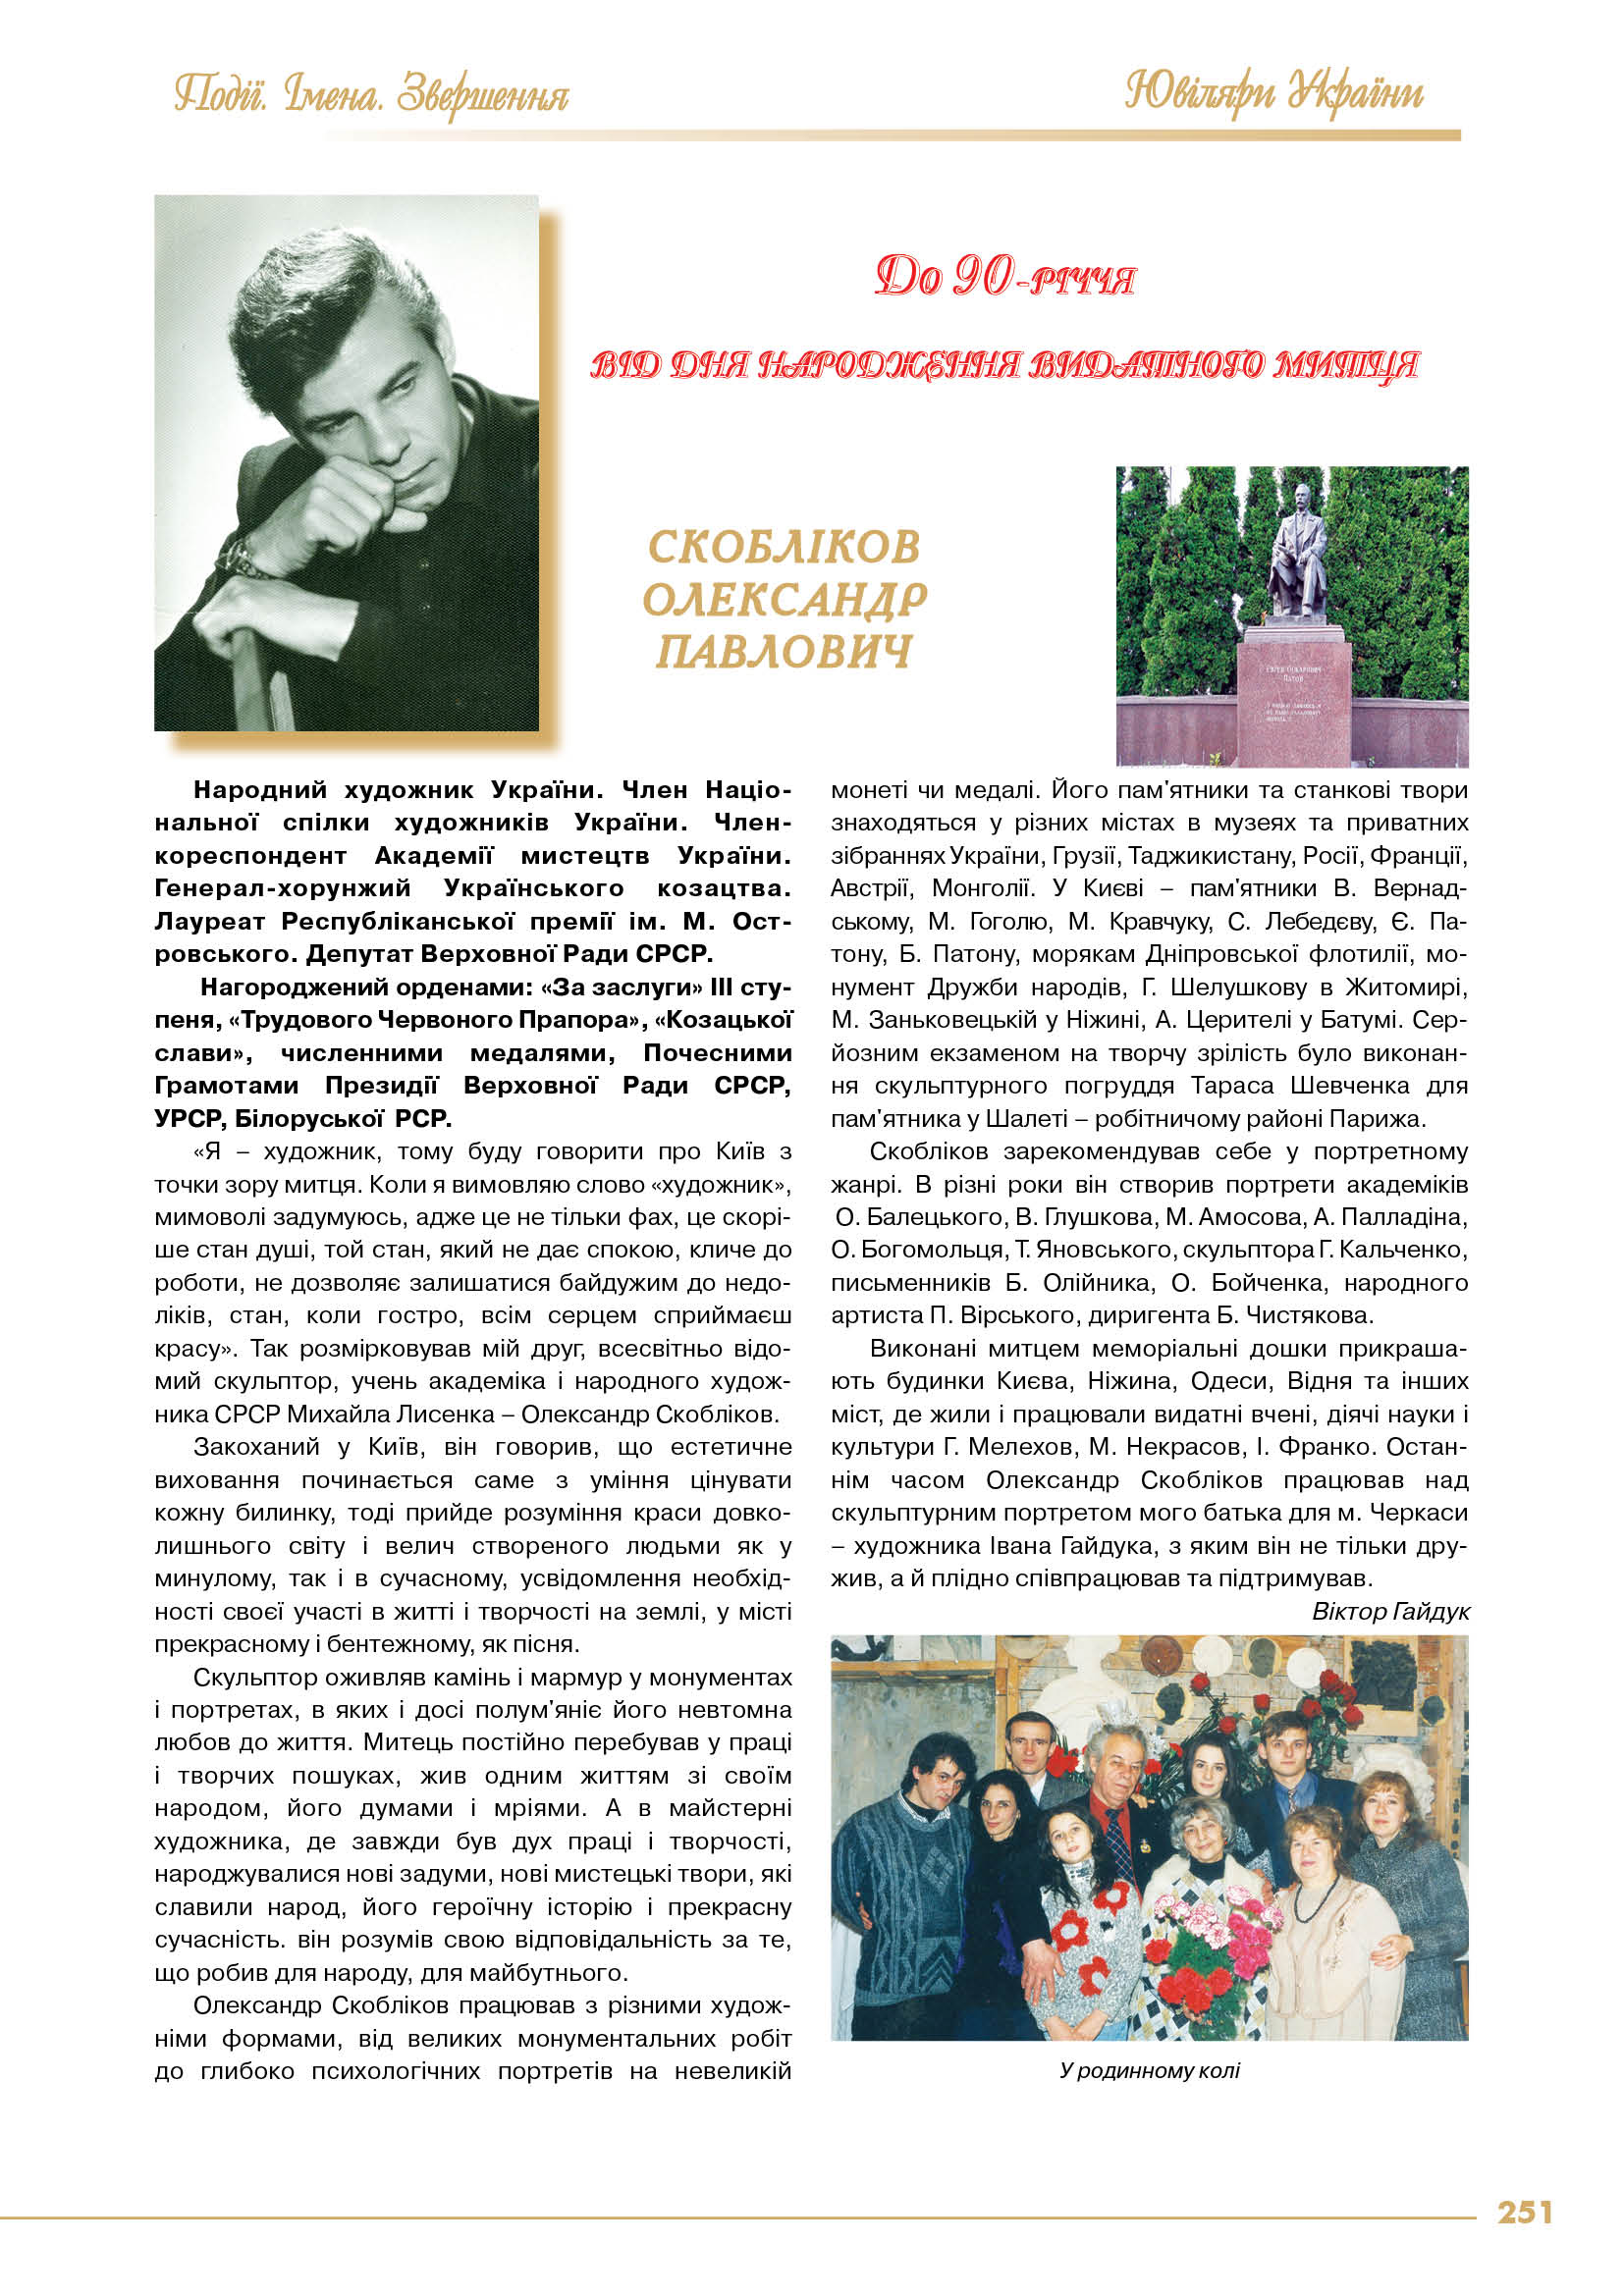 Скобліков Олександр Павлович